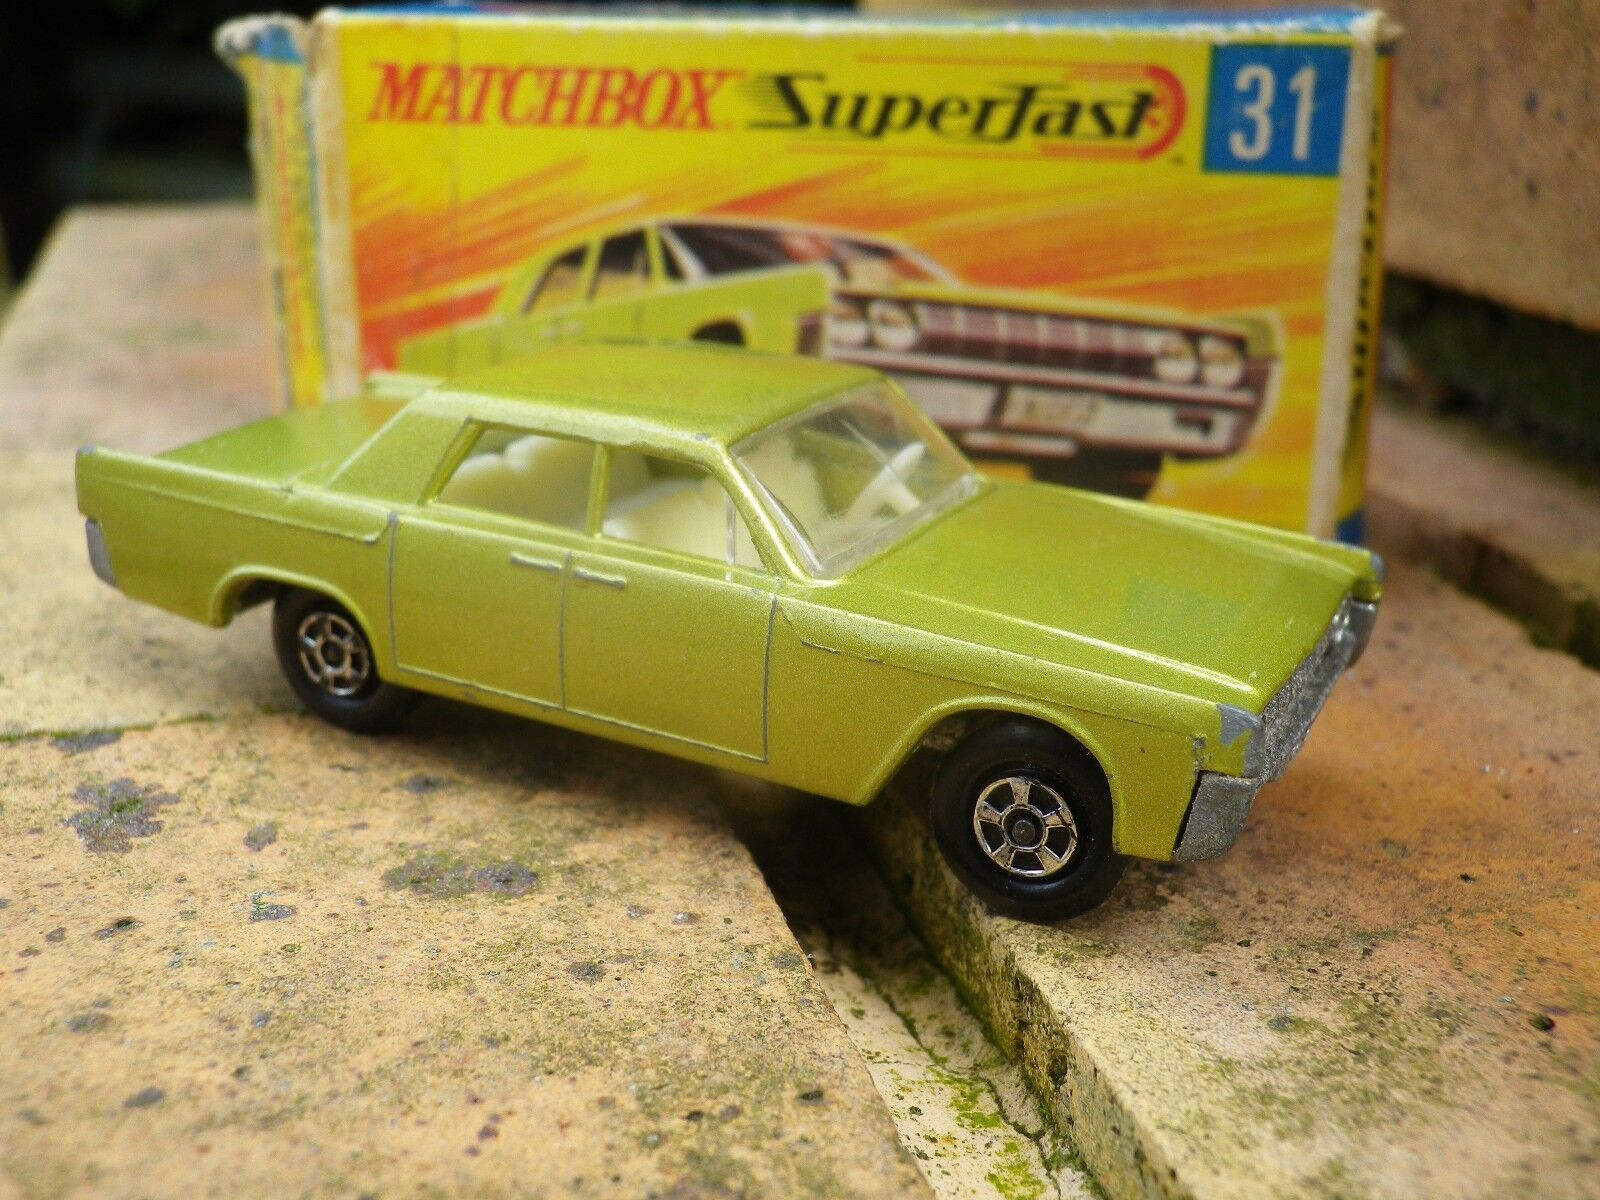 Matchbox lesney superfast 31 lincoln continental tres bon etat + original box